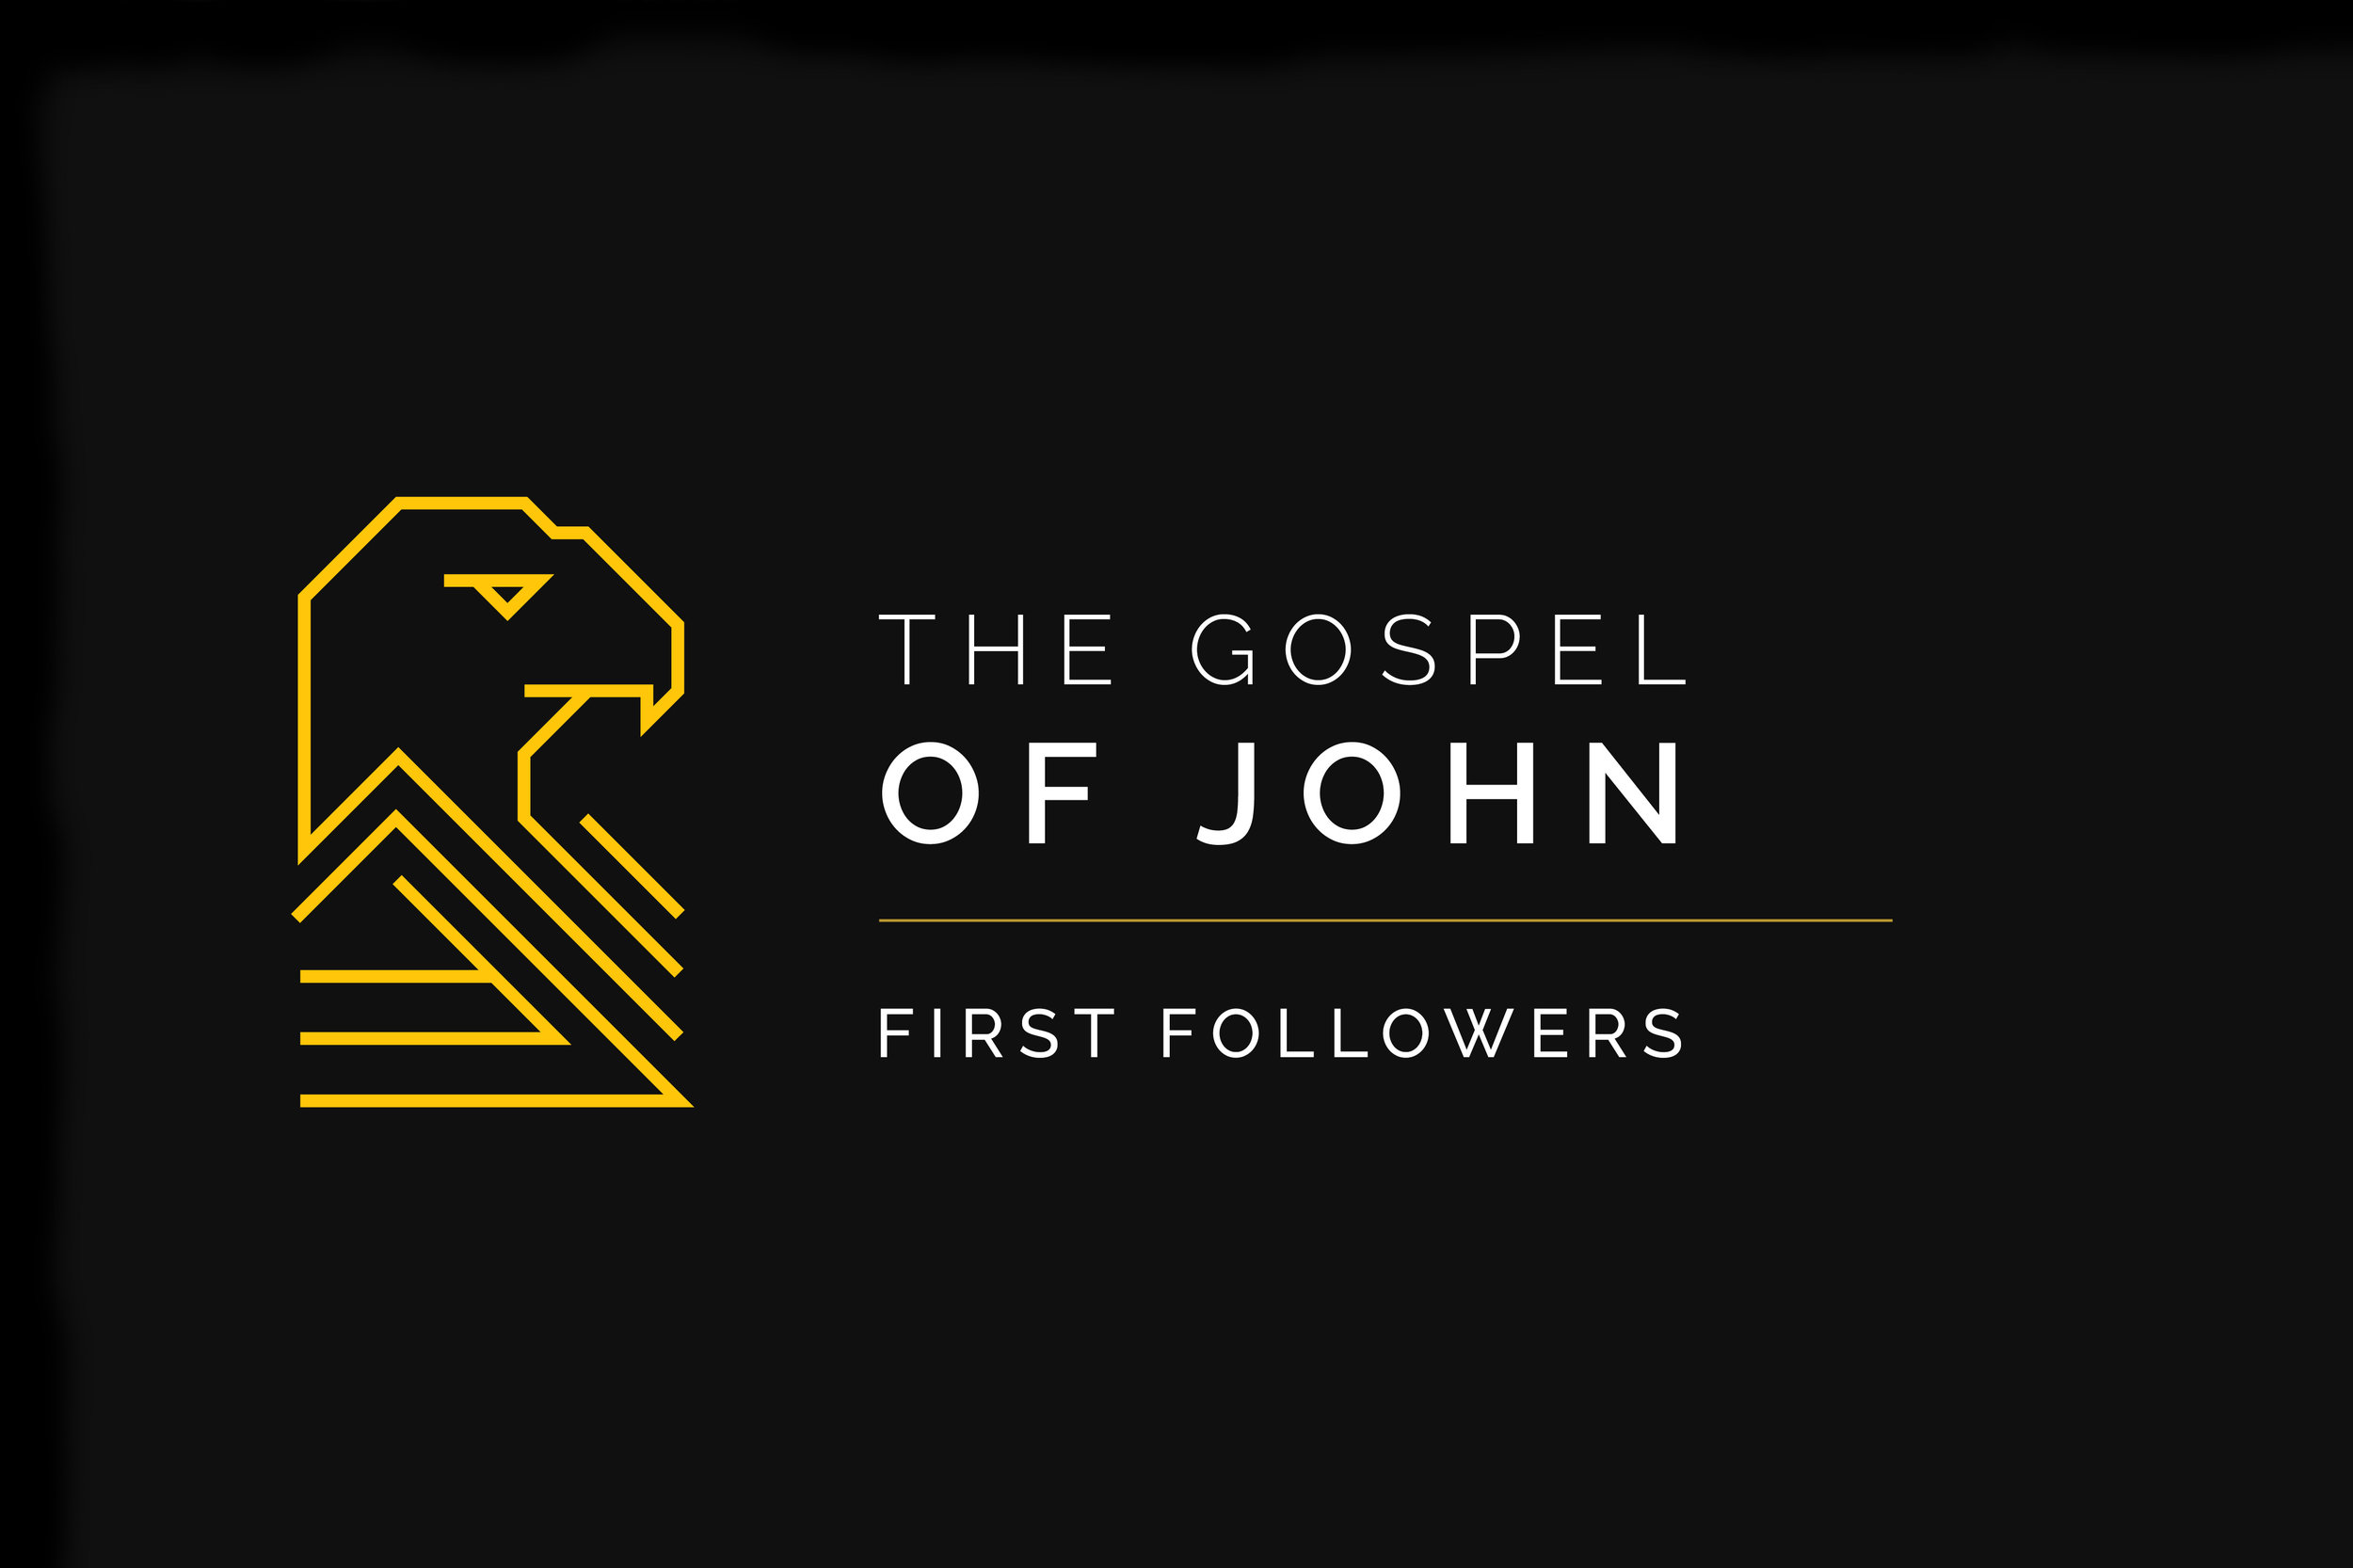 The-Gospel-of-John----First-Followers.jpg